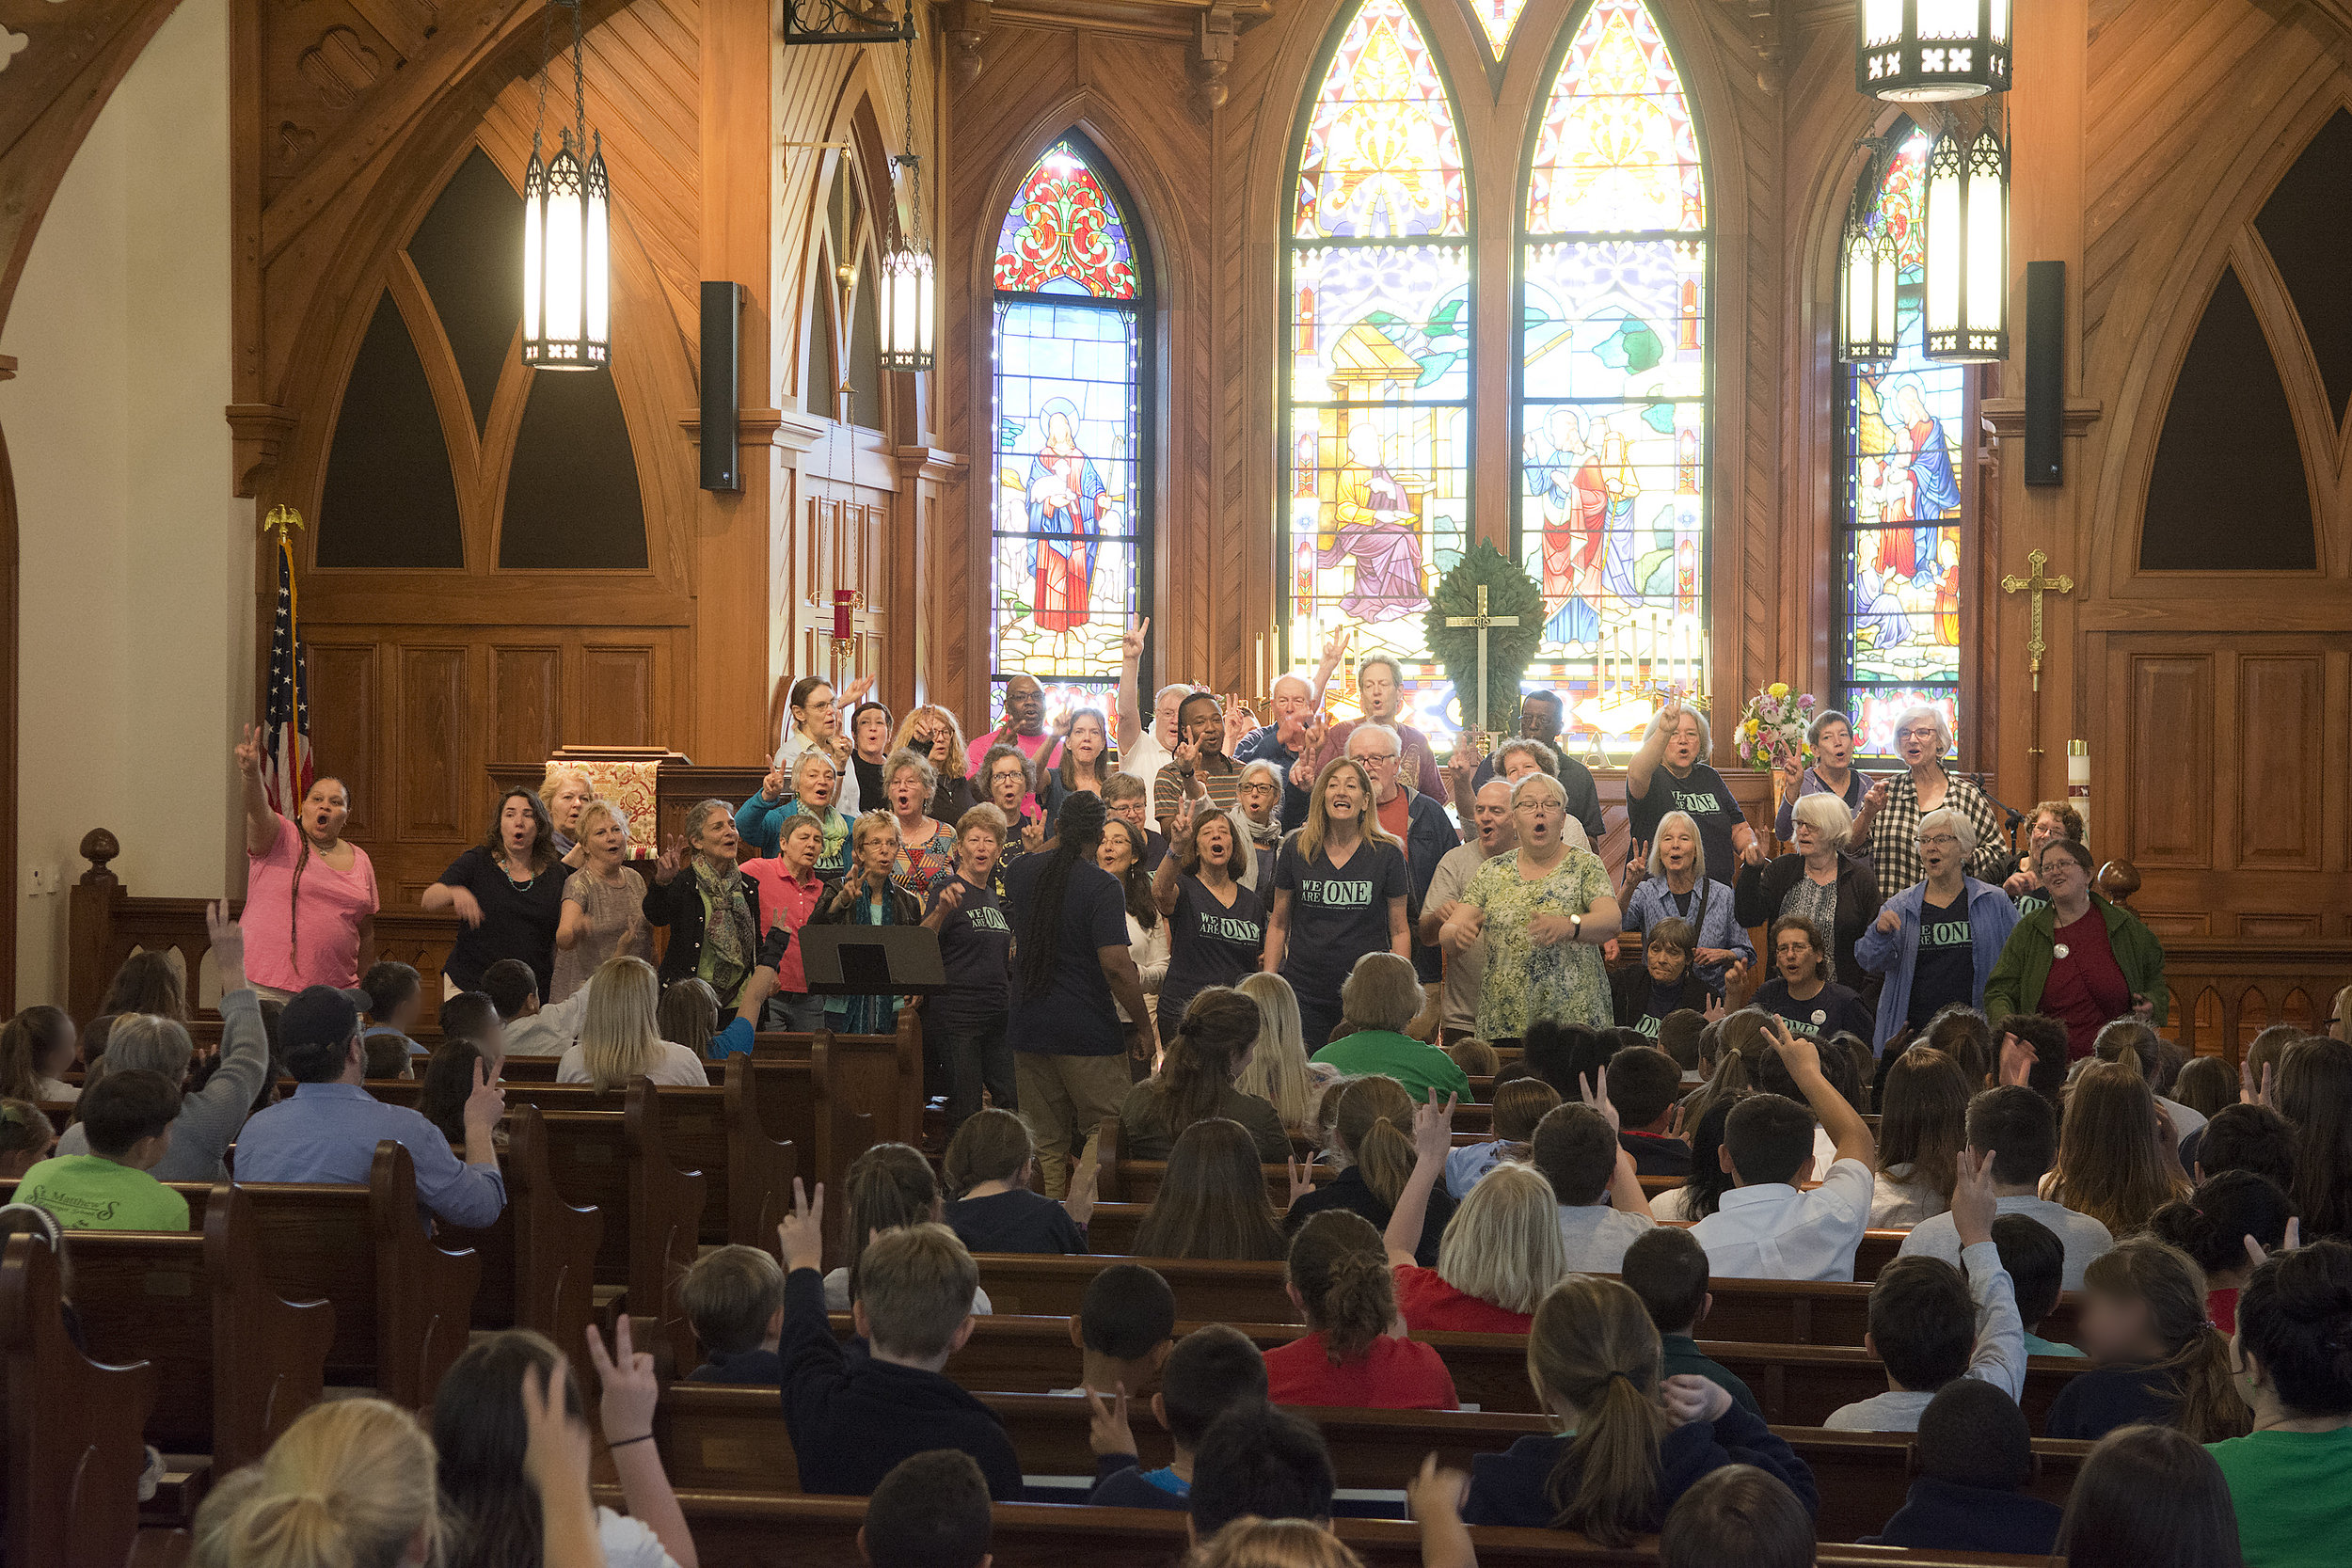 JB Unplanned concert at an Episcopal school